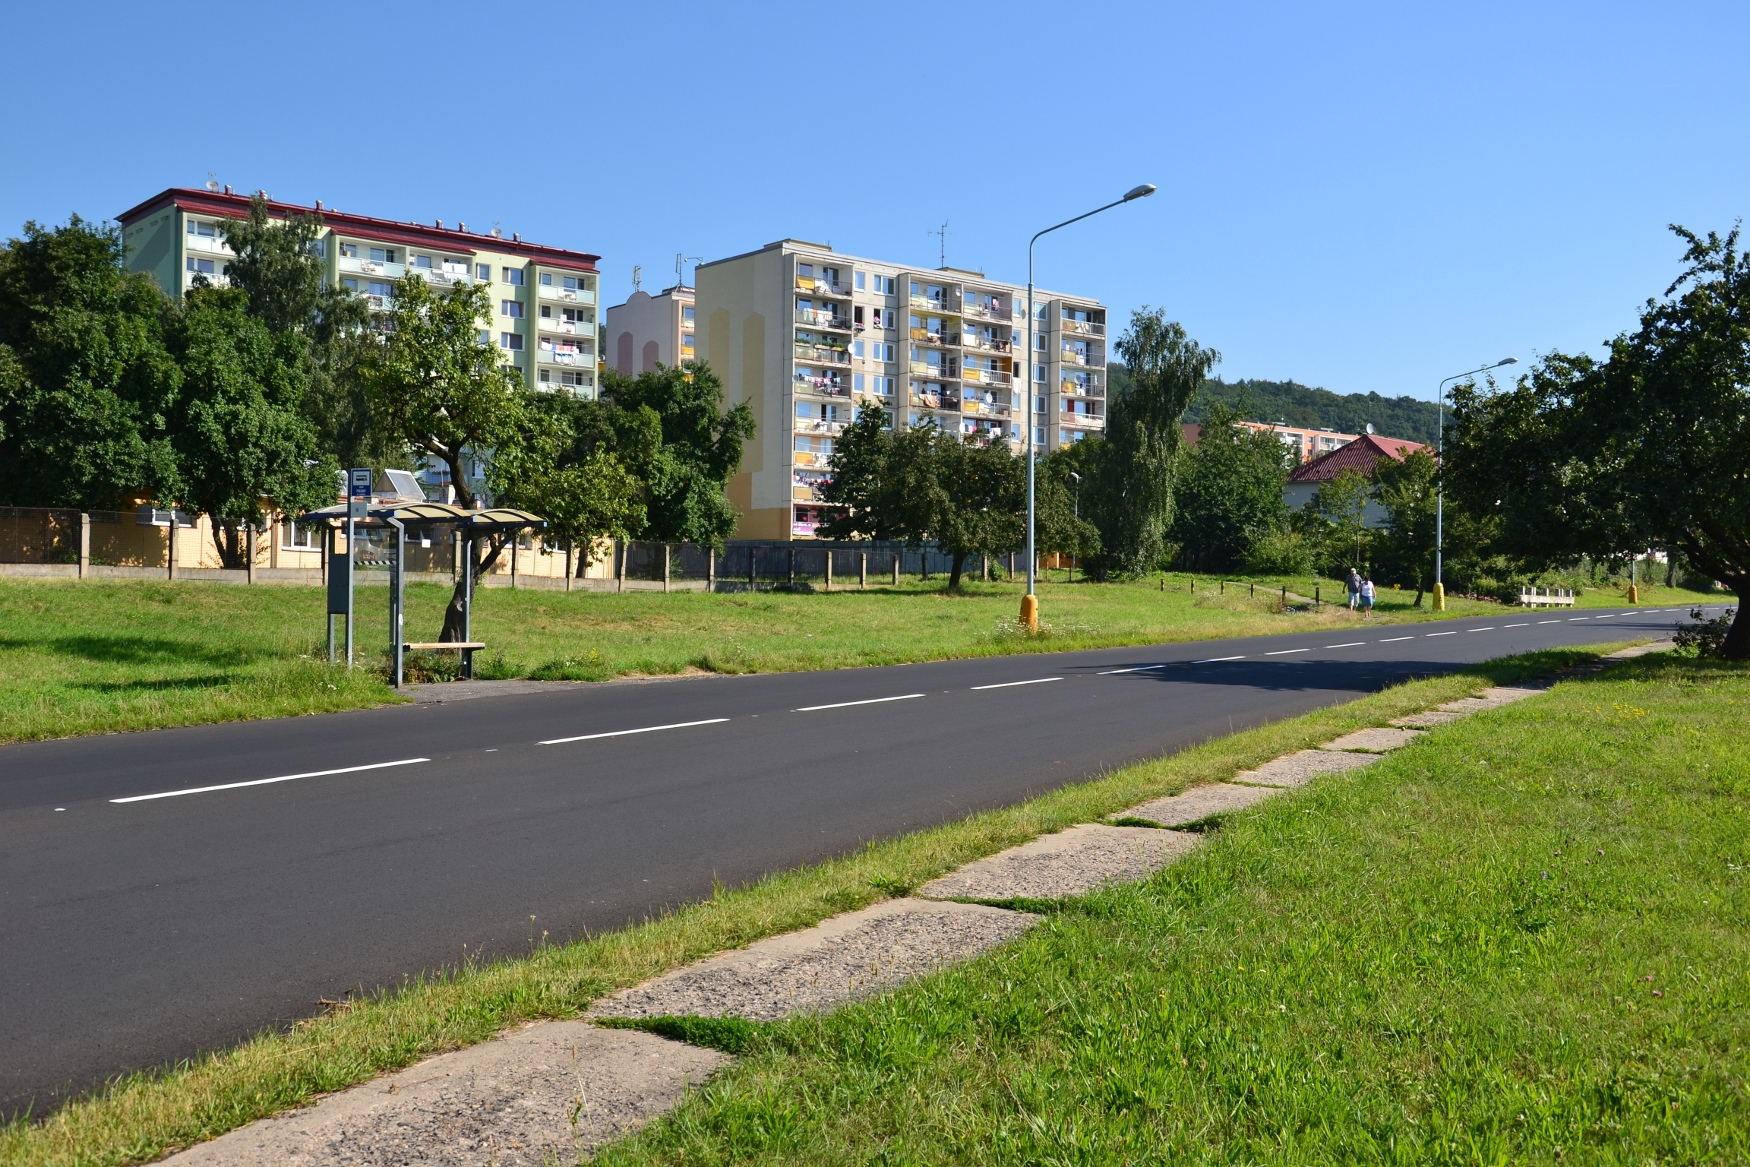 Plattenbauviertel in Litvínov (Foto: Petr Kinšt, CC BY-SA 3.0)